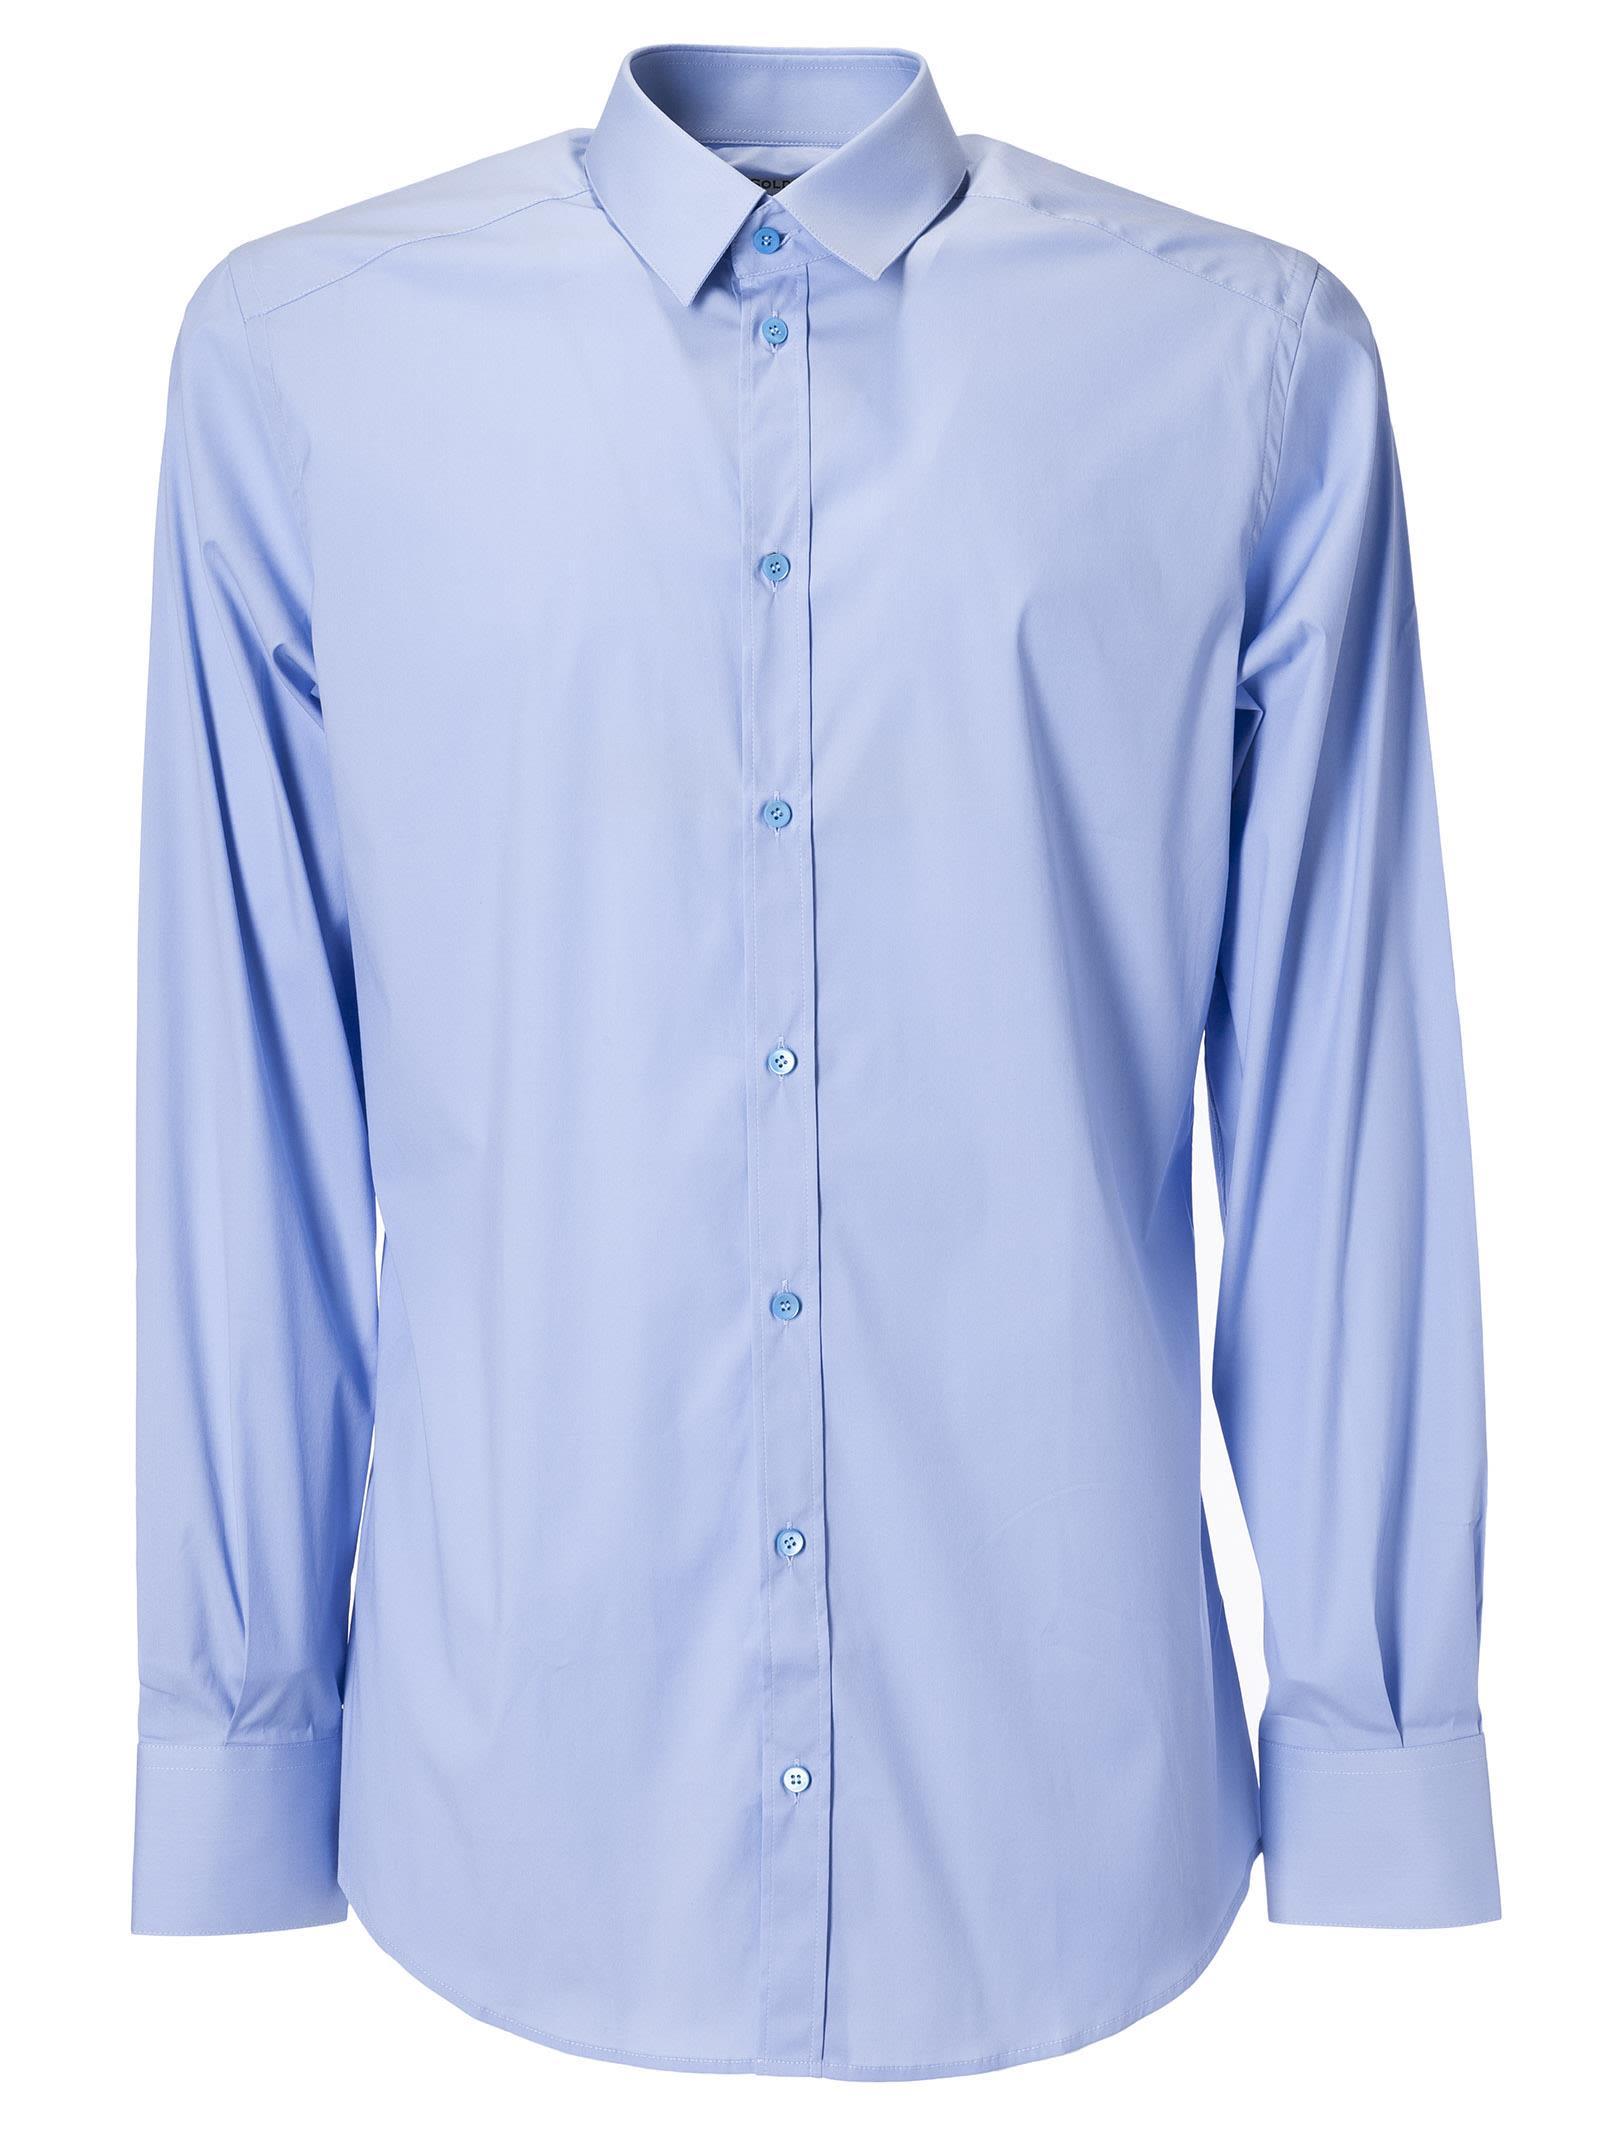 Dolce & Gabbana Stretch Shirt